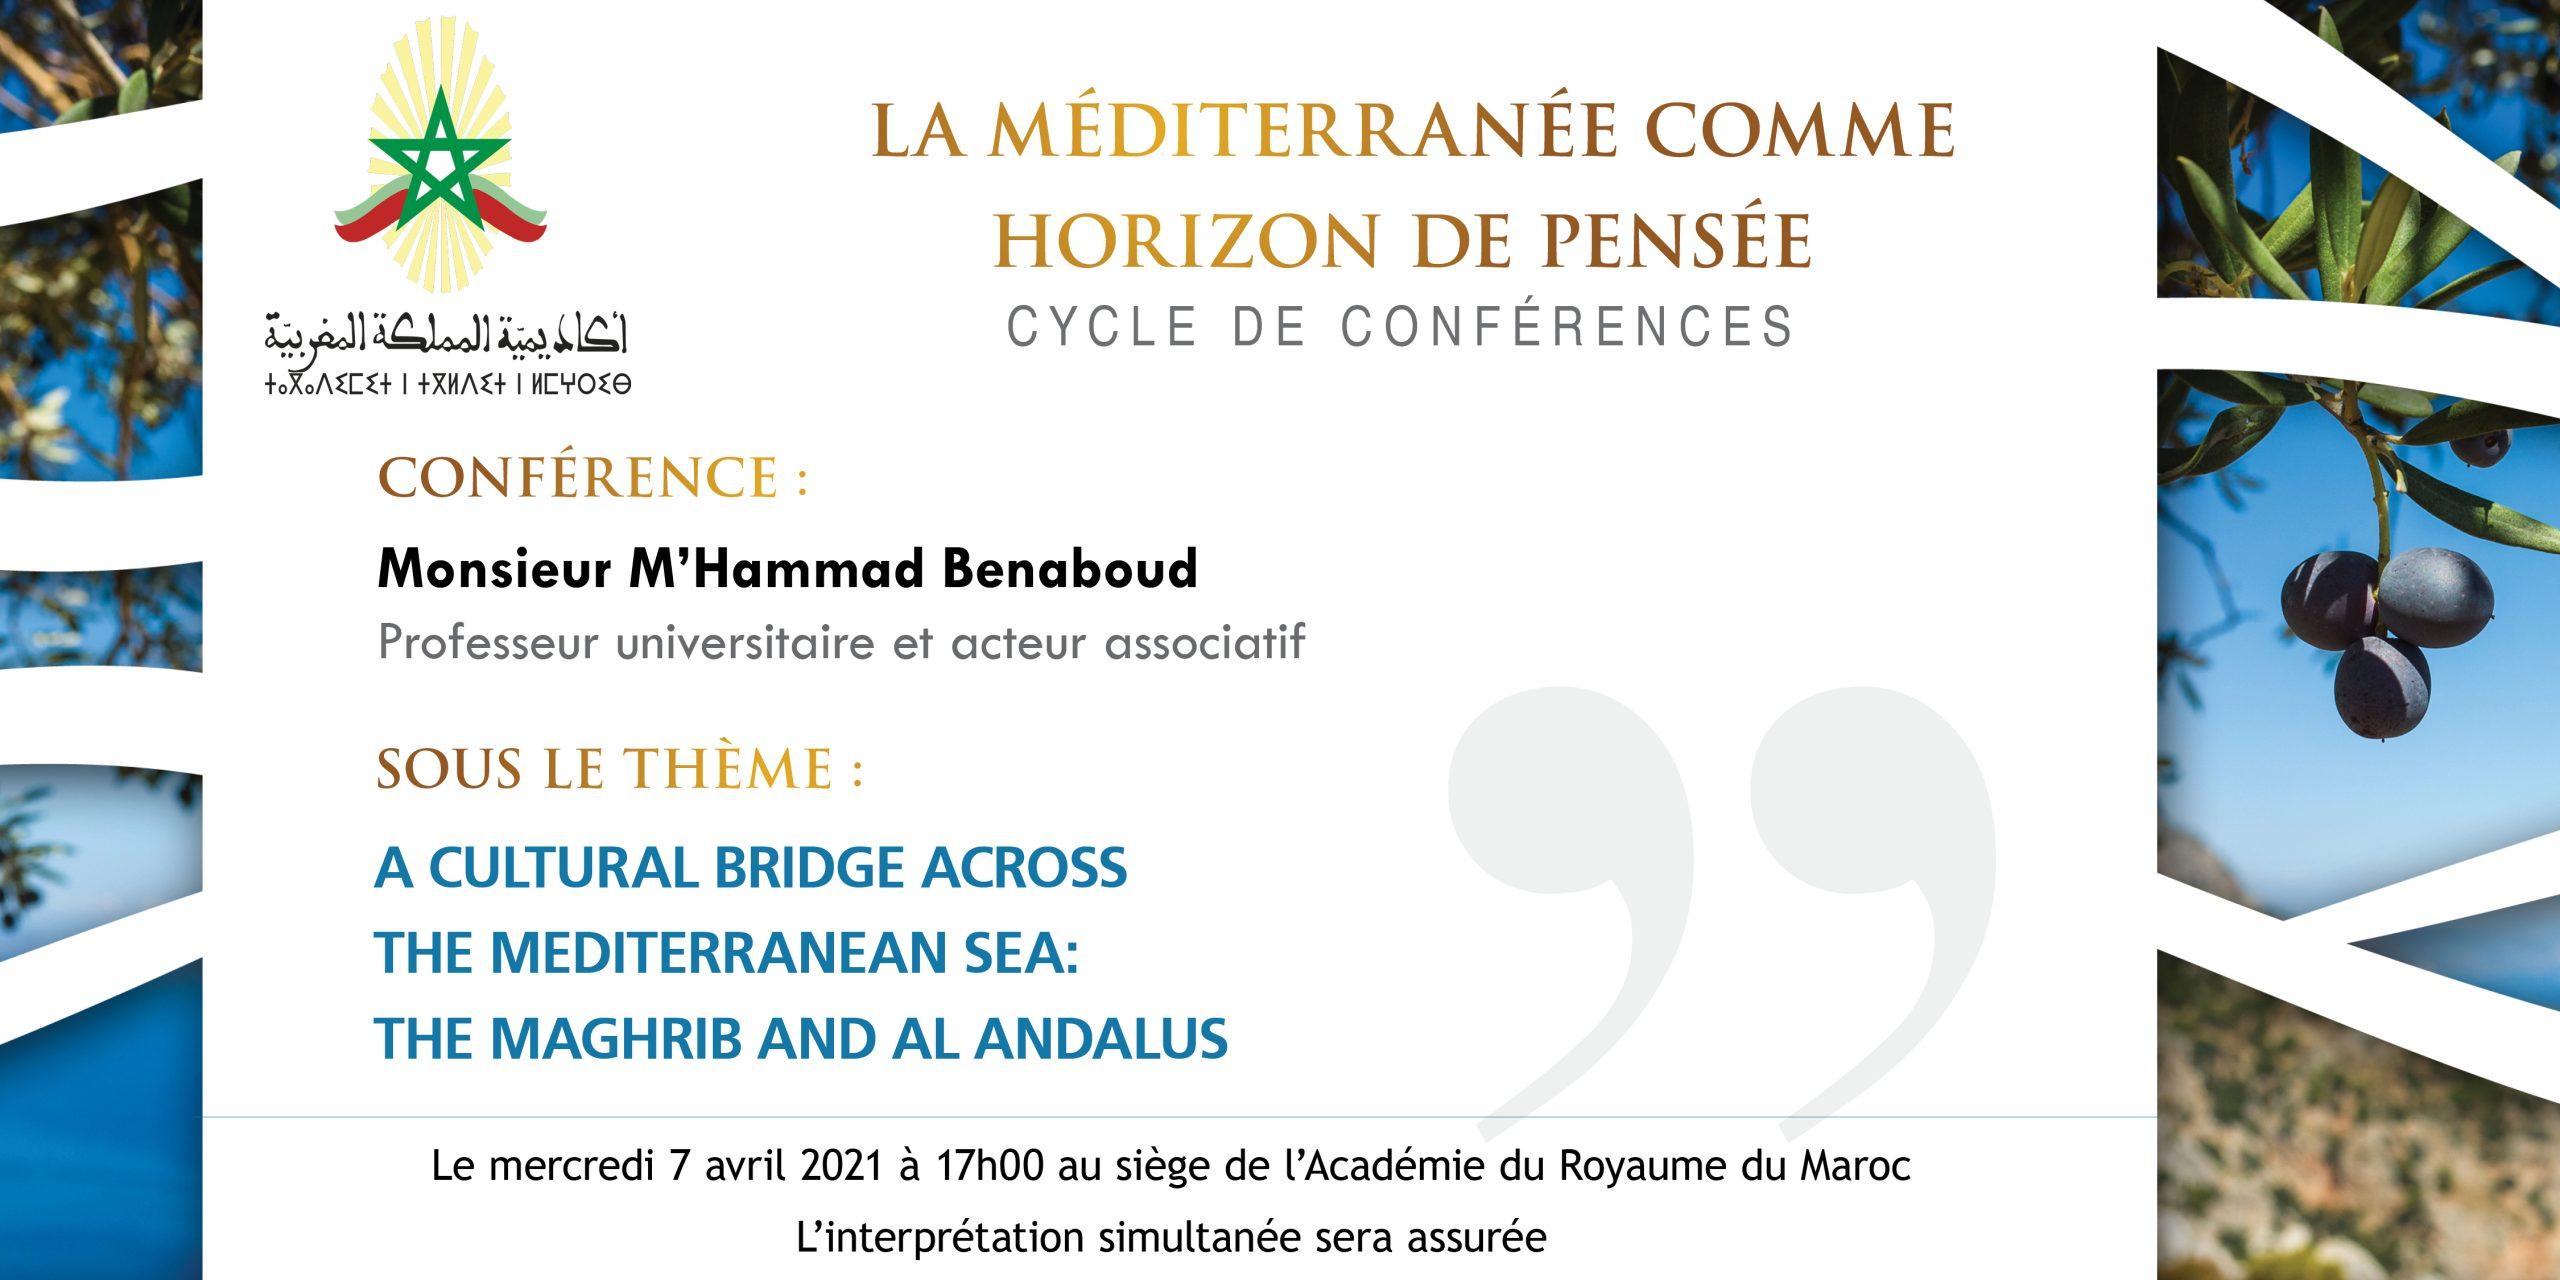 A Cultural Bridge Across the Mediterranean Sea: The Maghrib and Al Andalus